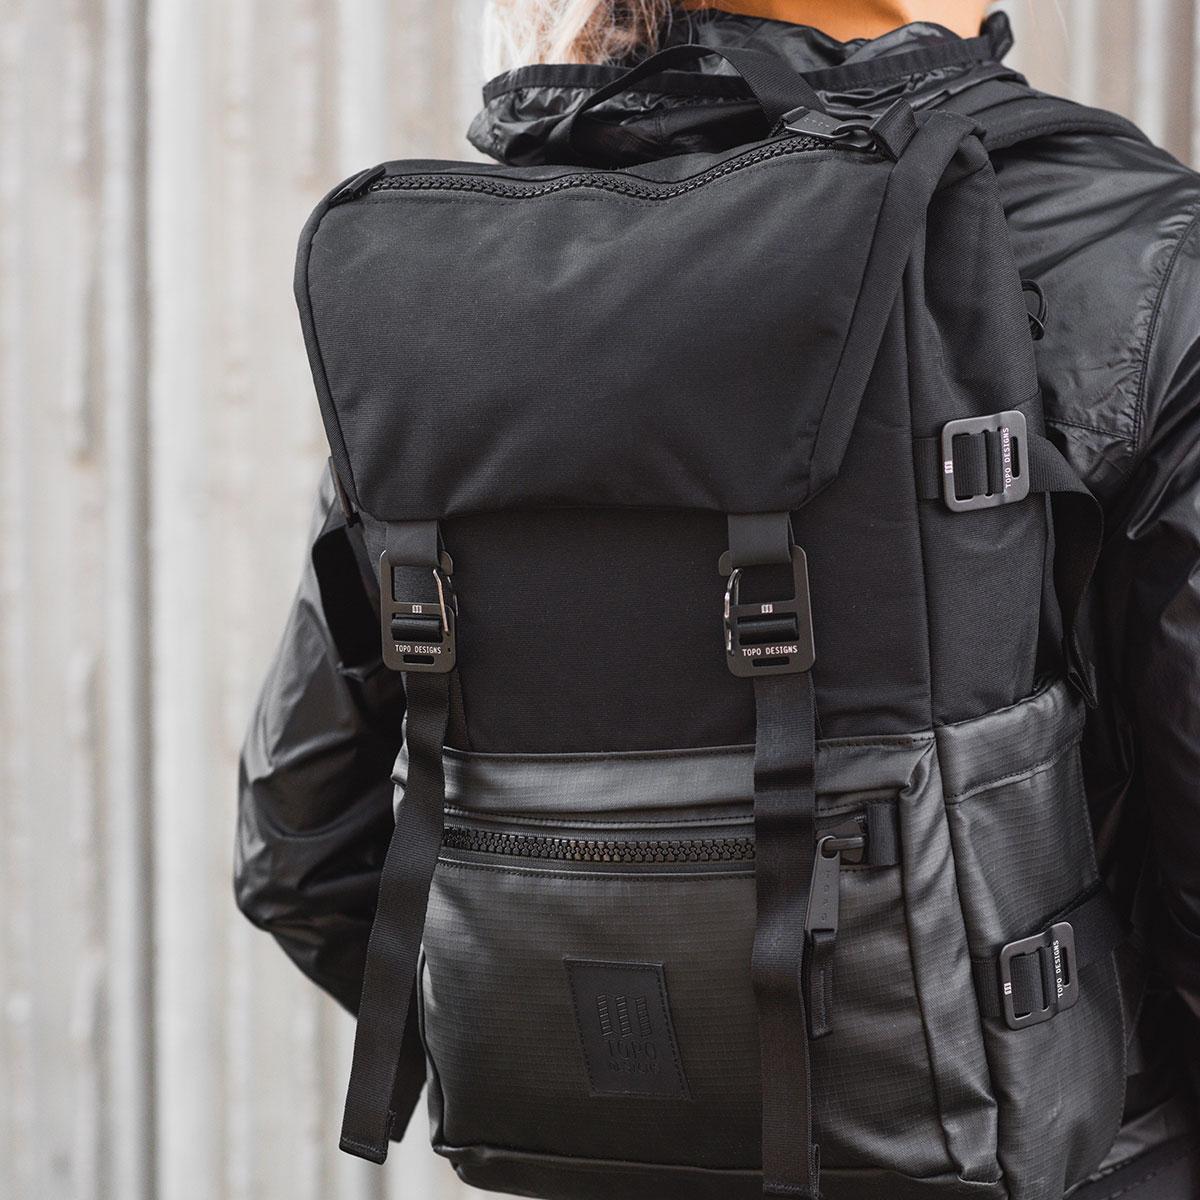 Topo Designs Rover Pack Premium Black, sterke, moderne en tijdloze rugzak